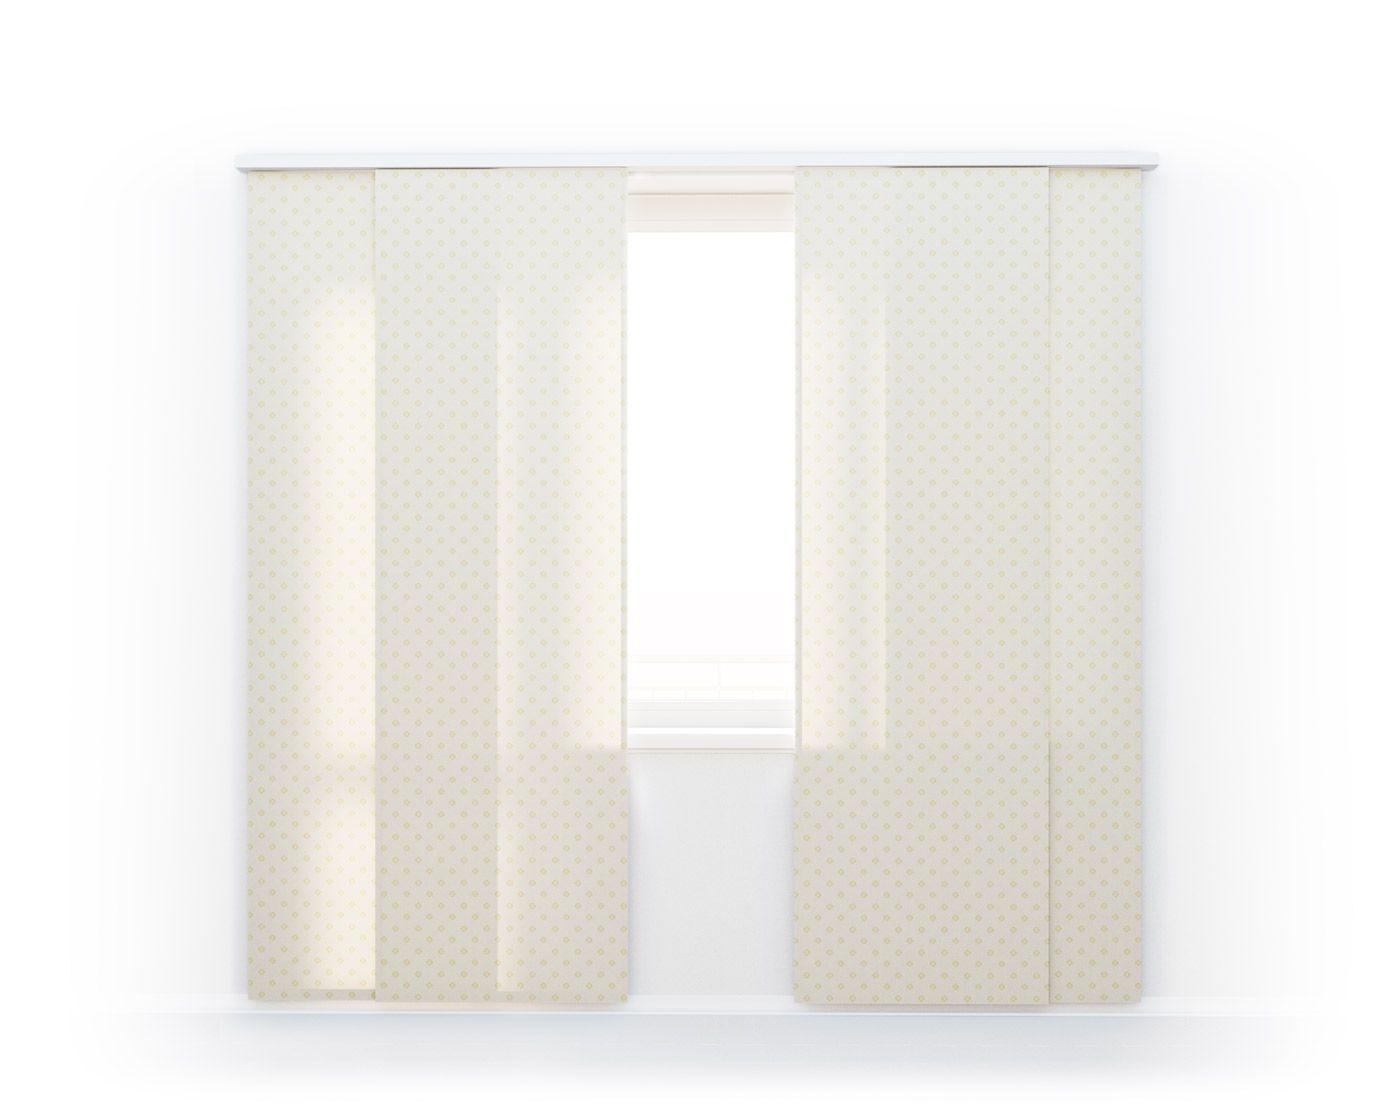 Японские шторы Louis D'or, 2383/15